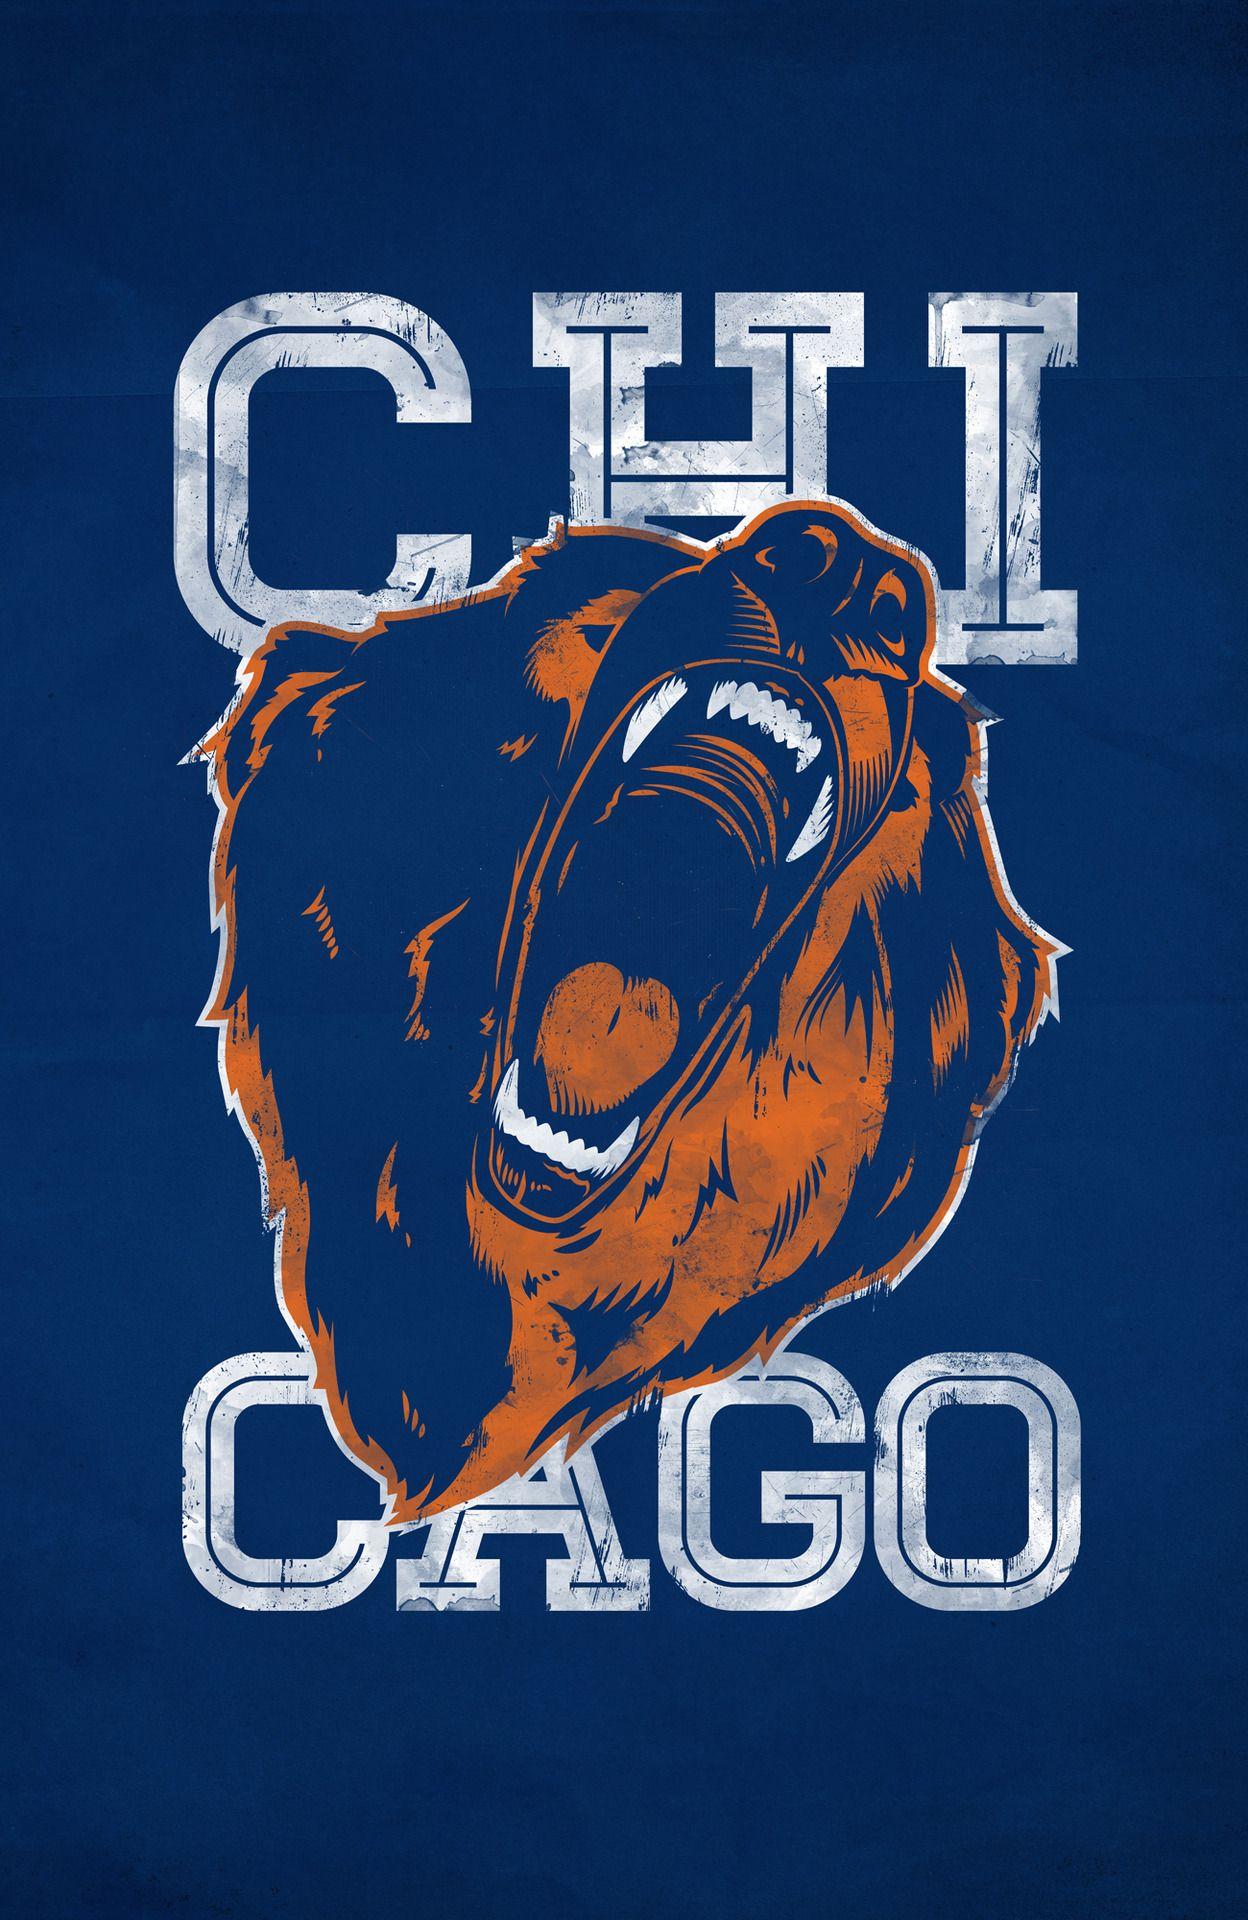 987b16012a01da8869412dd590611843 awesome chicago bears illustration bears forever